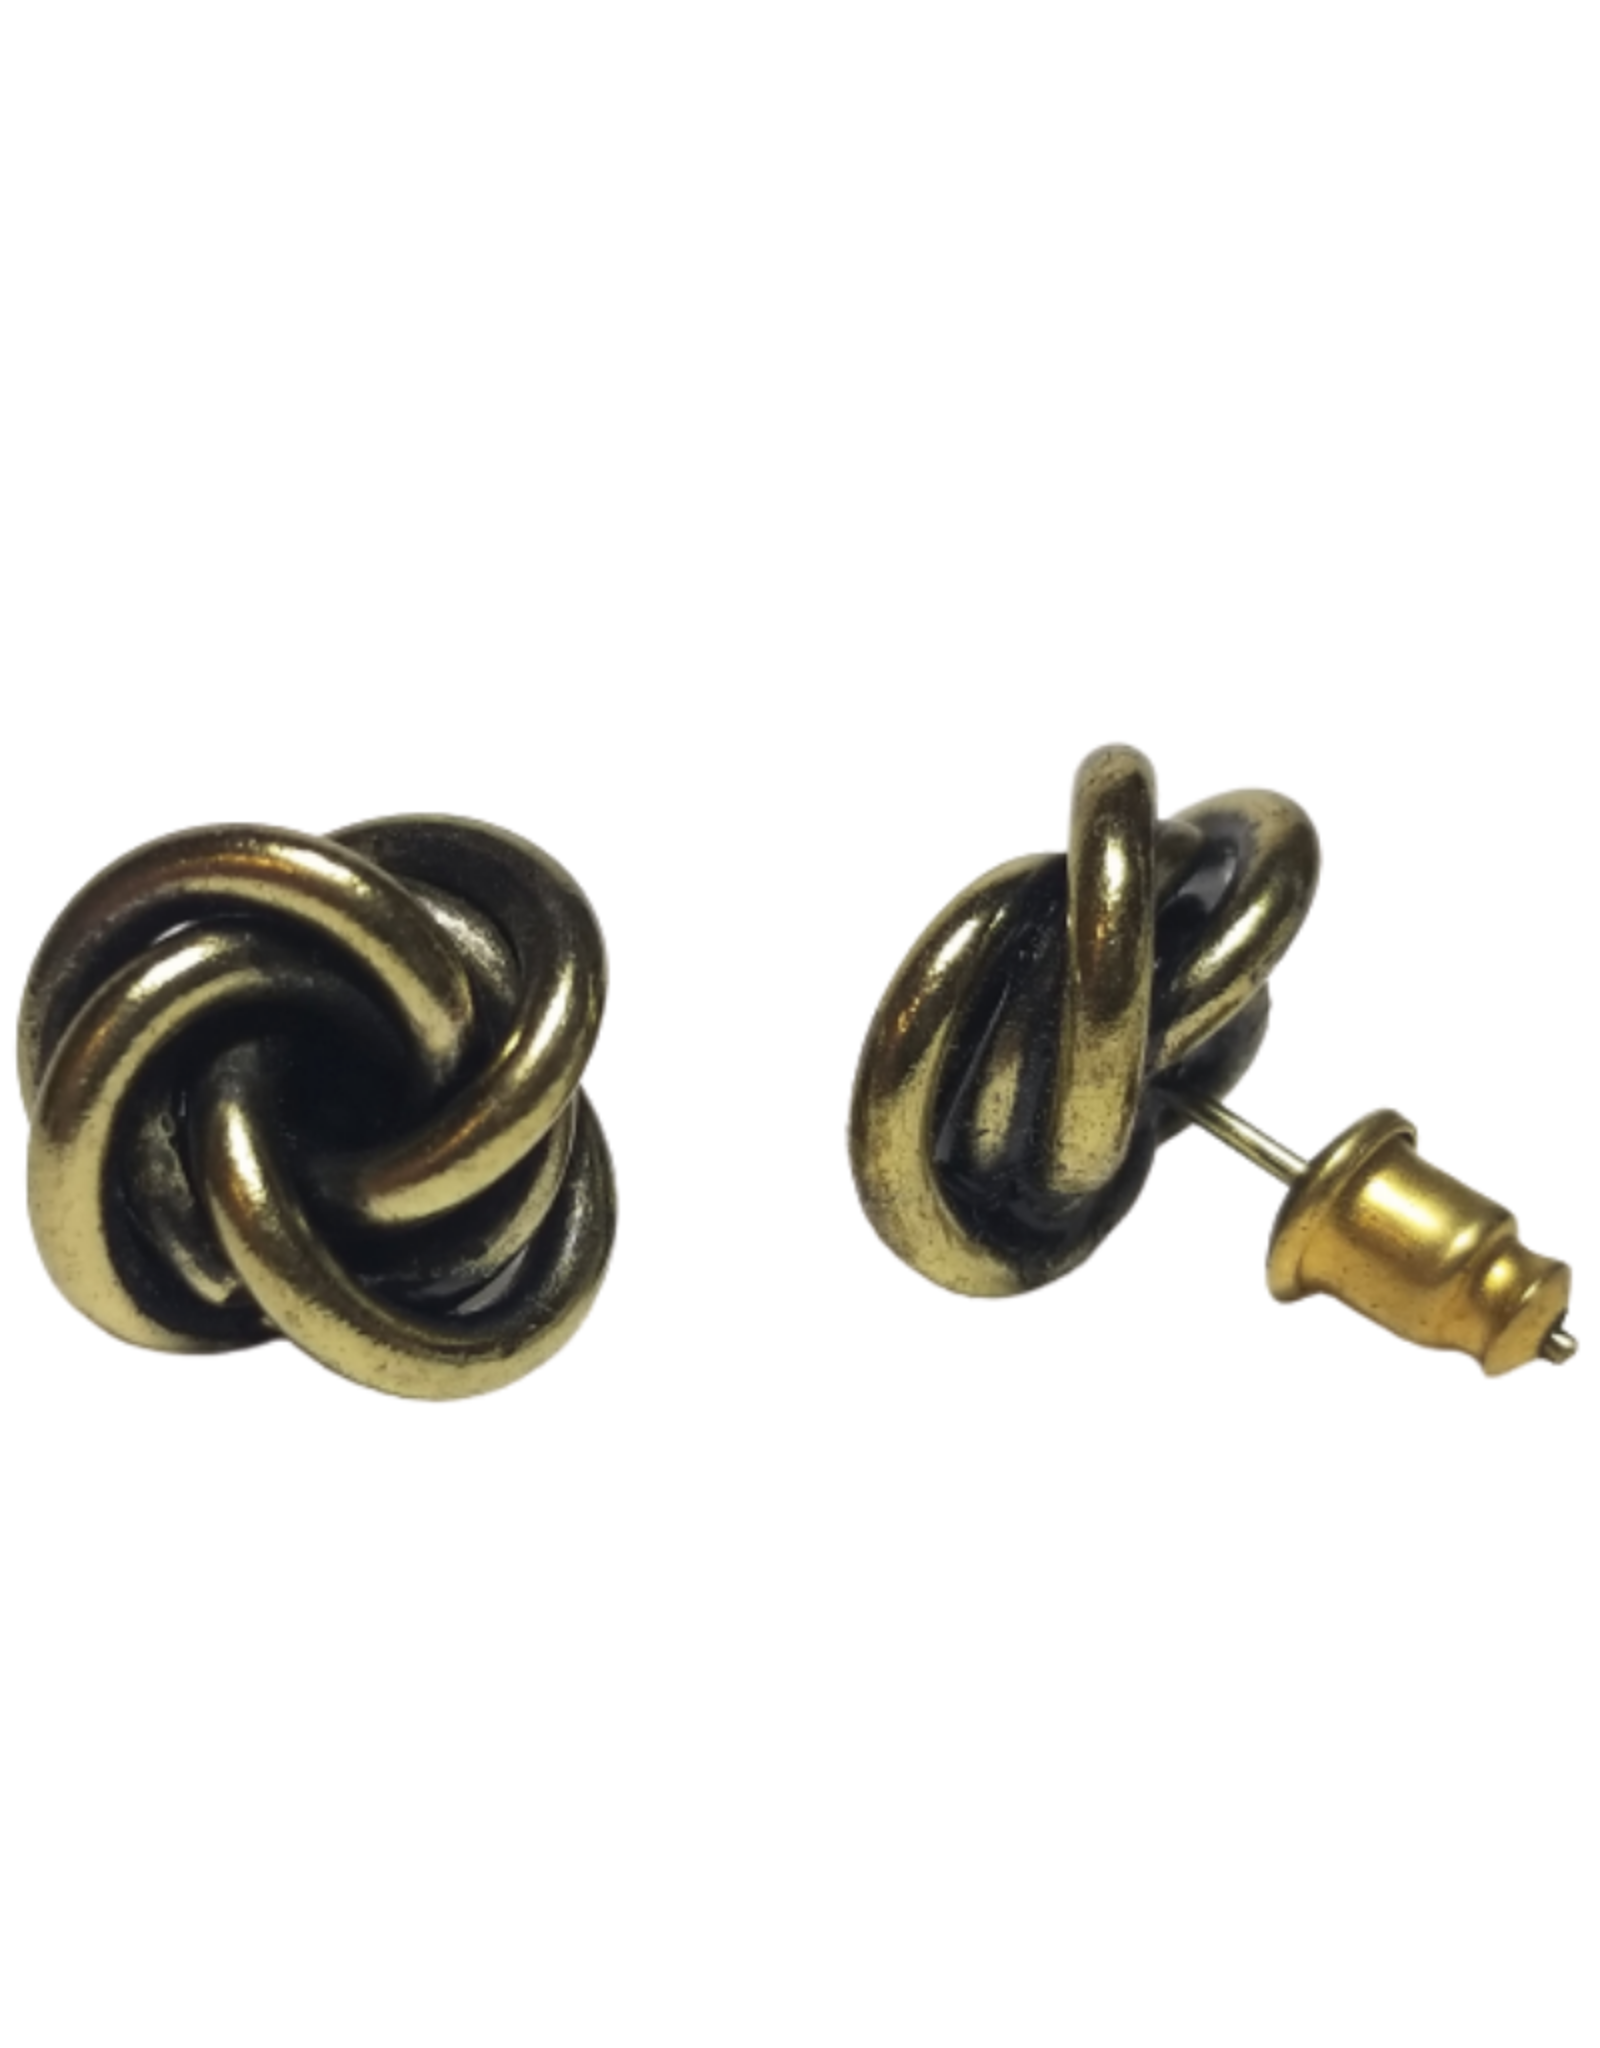 Twisted Knot Stud Earrings